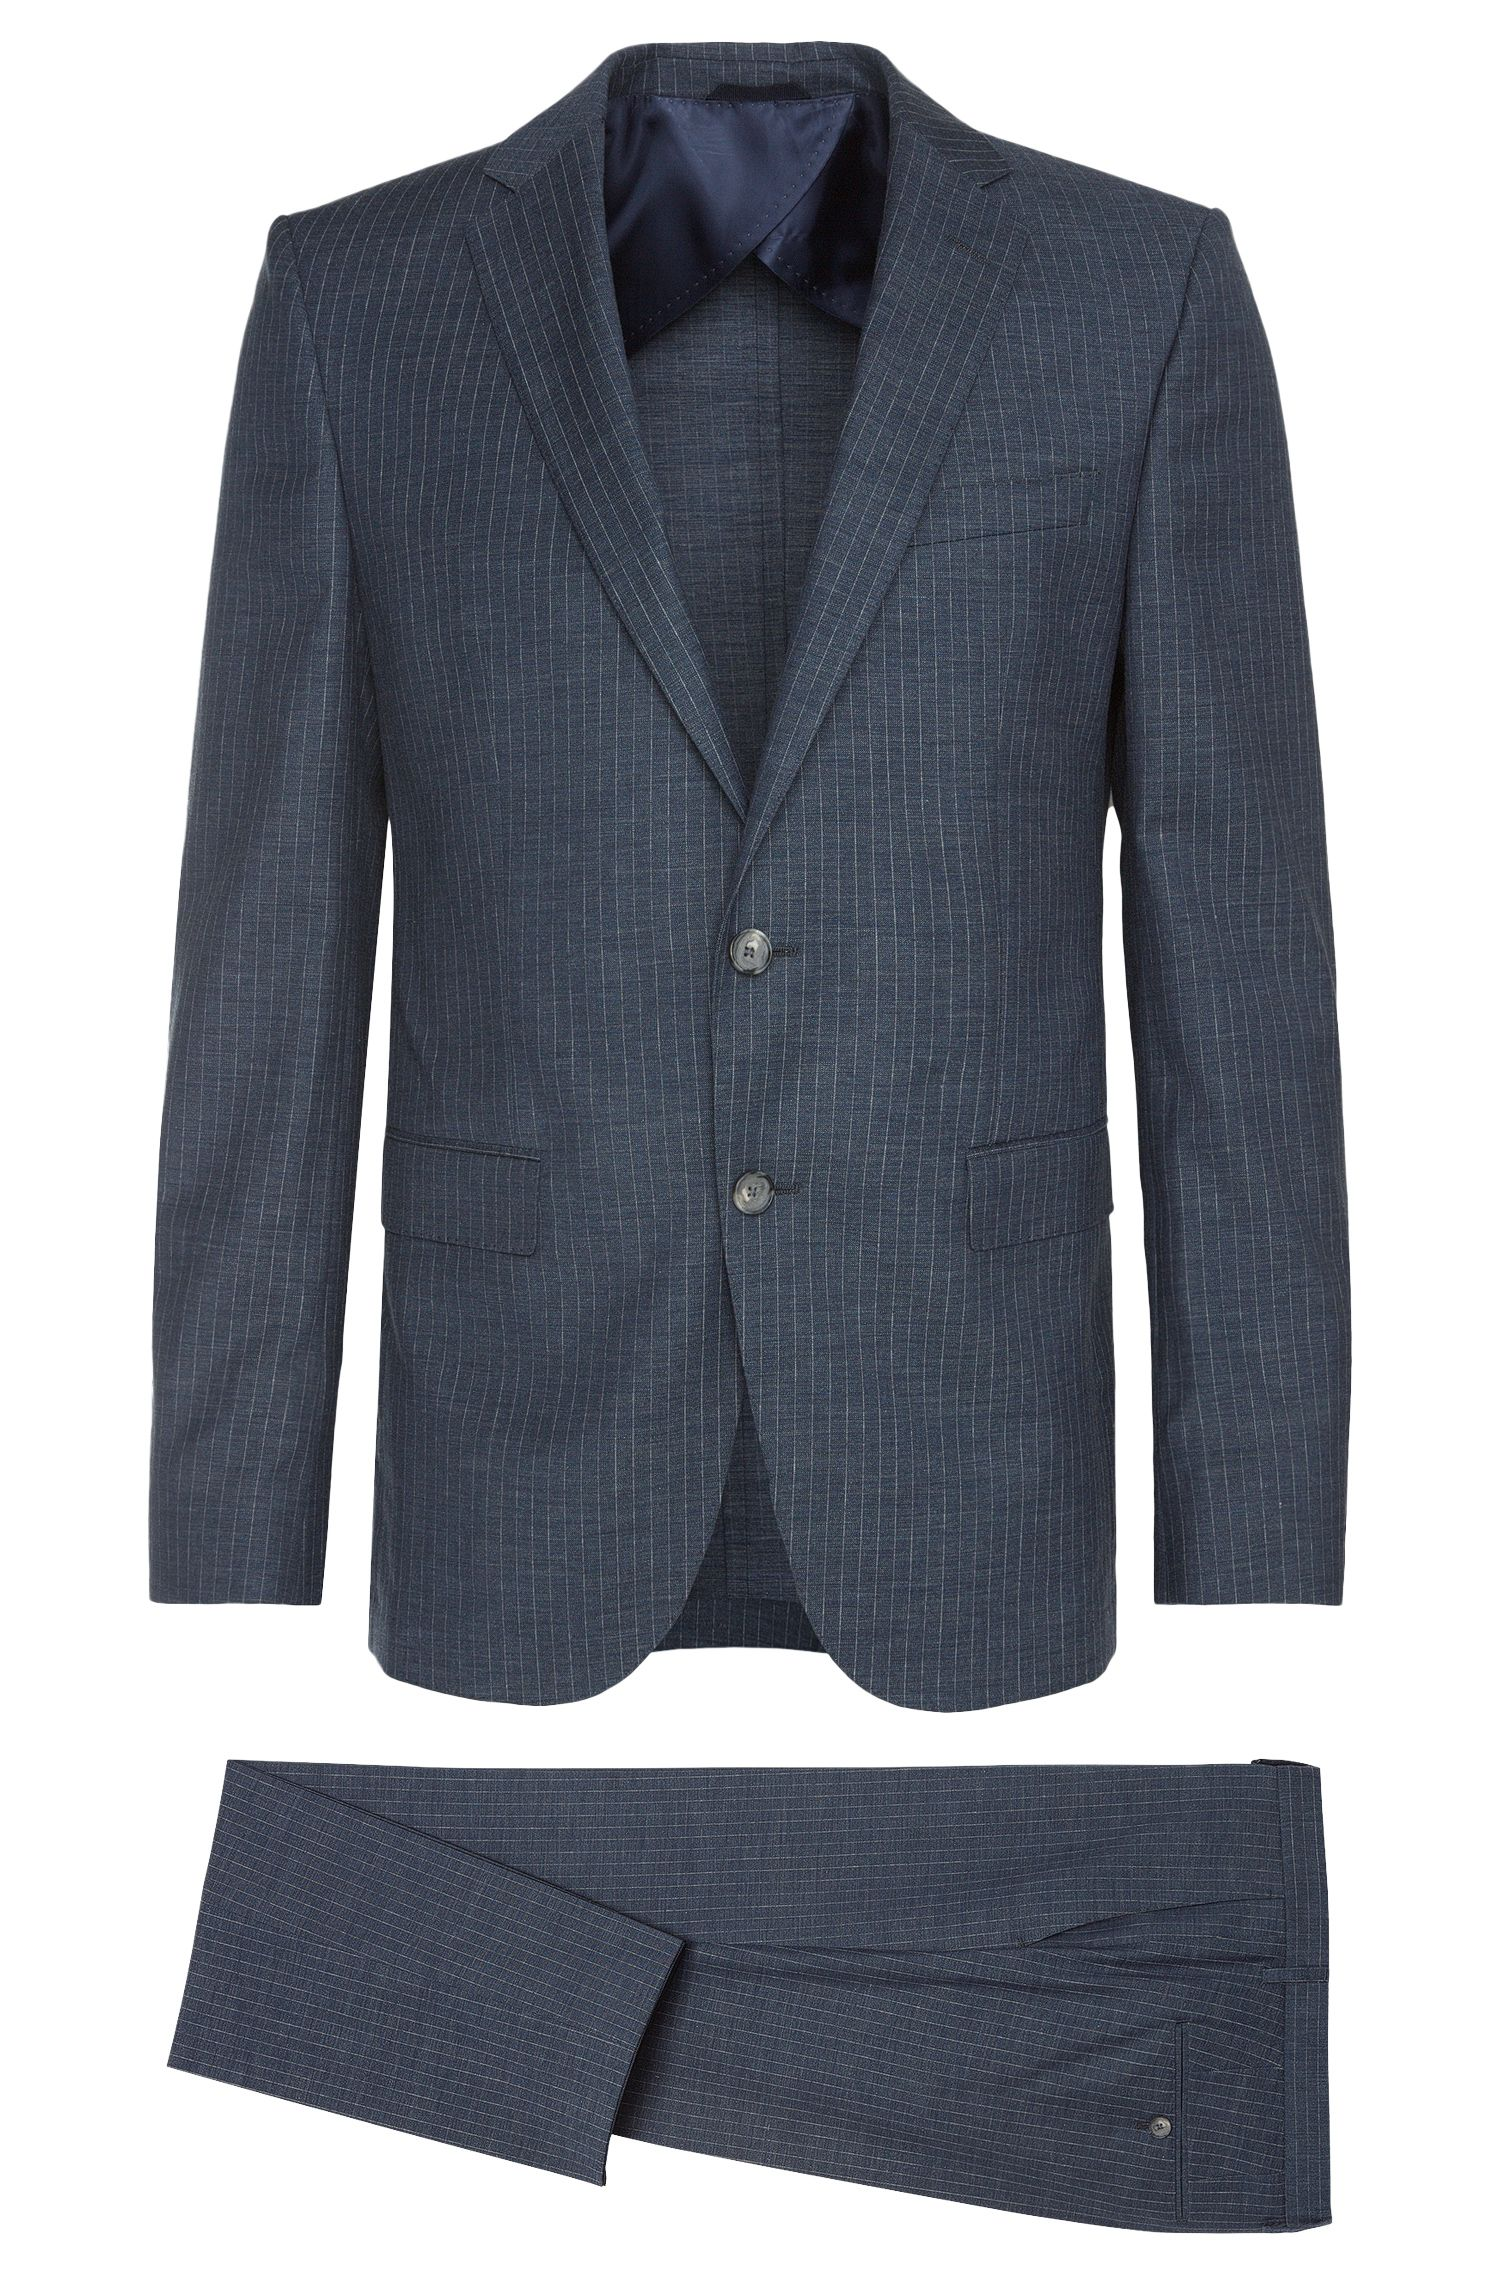 Virgin Wool Cotton Pinstripe Suit, Slim Fit | Nortan/Benno